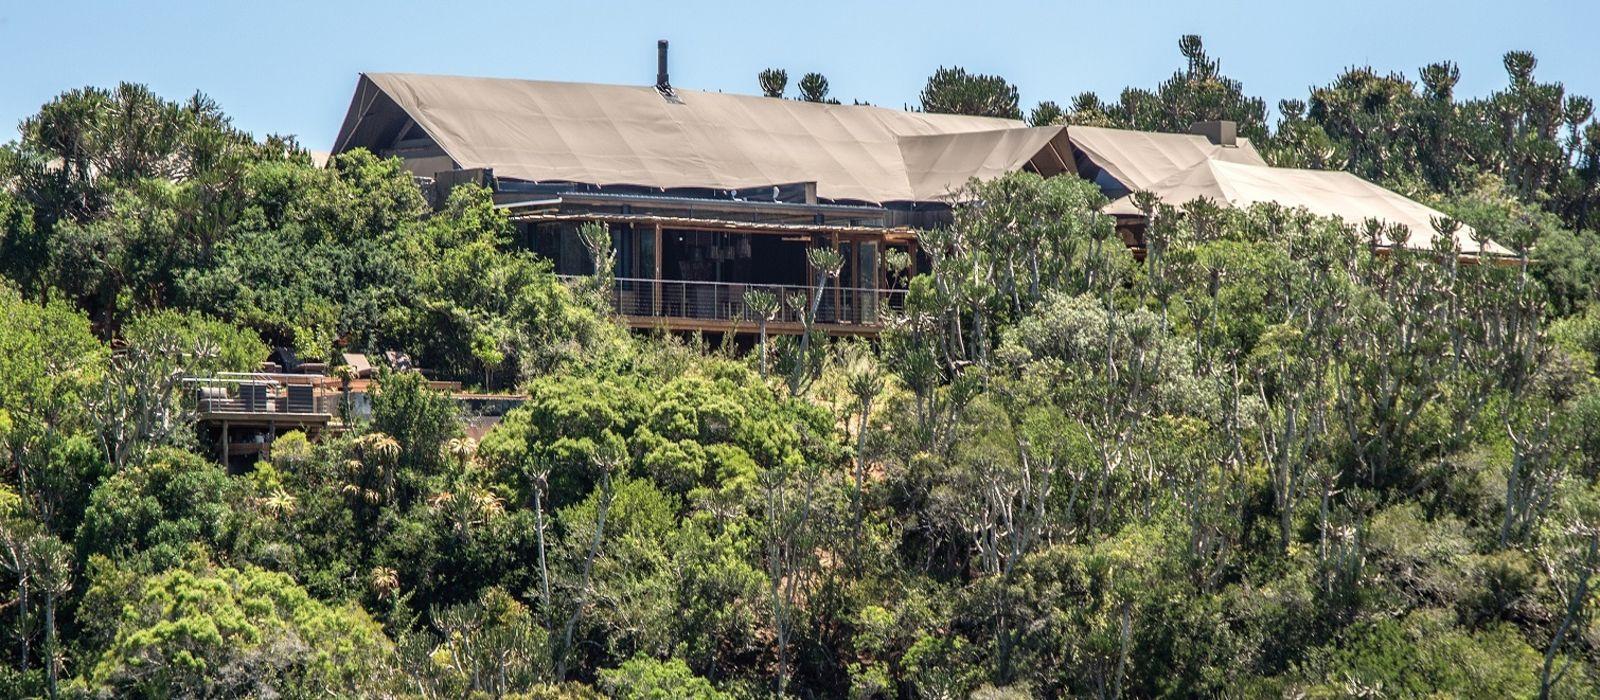 Hotel Kariega Settlers Drift South Africa